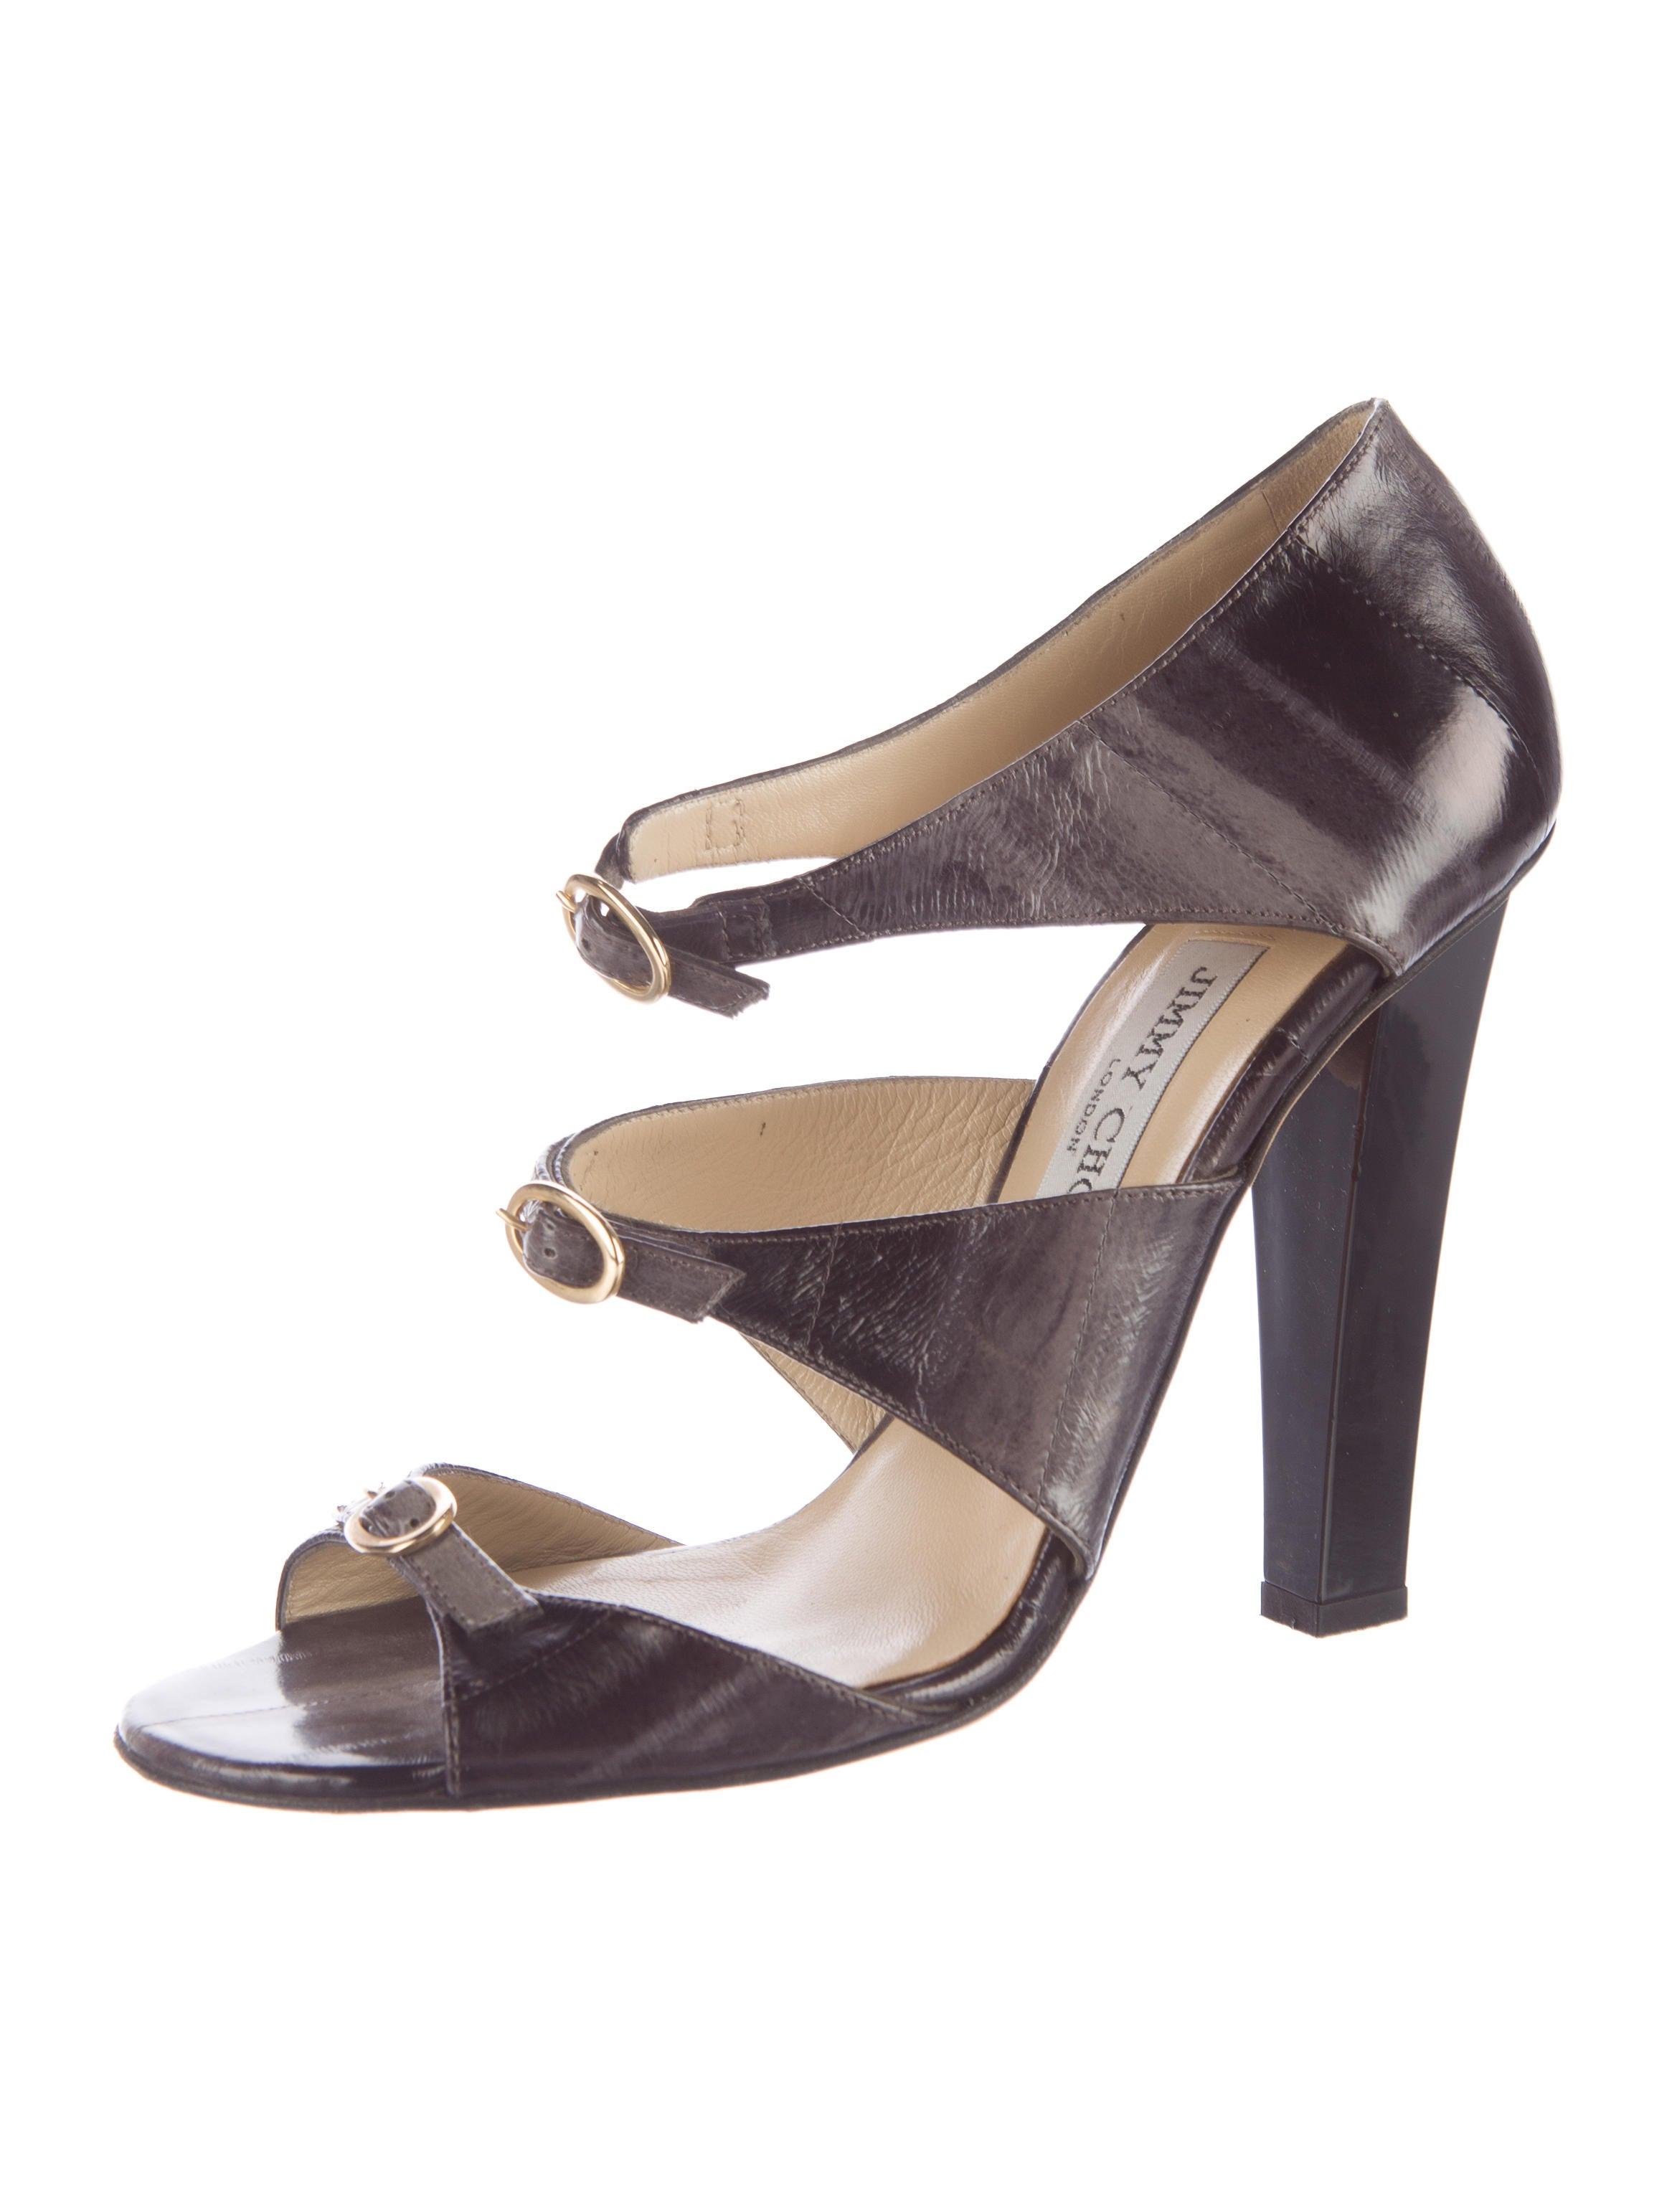 Jimmy Choo Eelskin Buckled Sandals cheap 2015 iX5Ggp0B4k